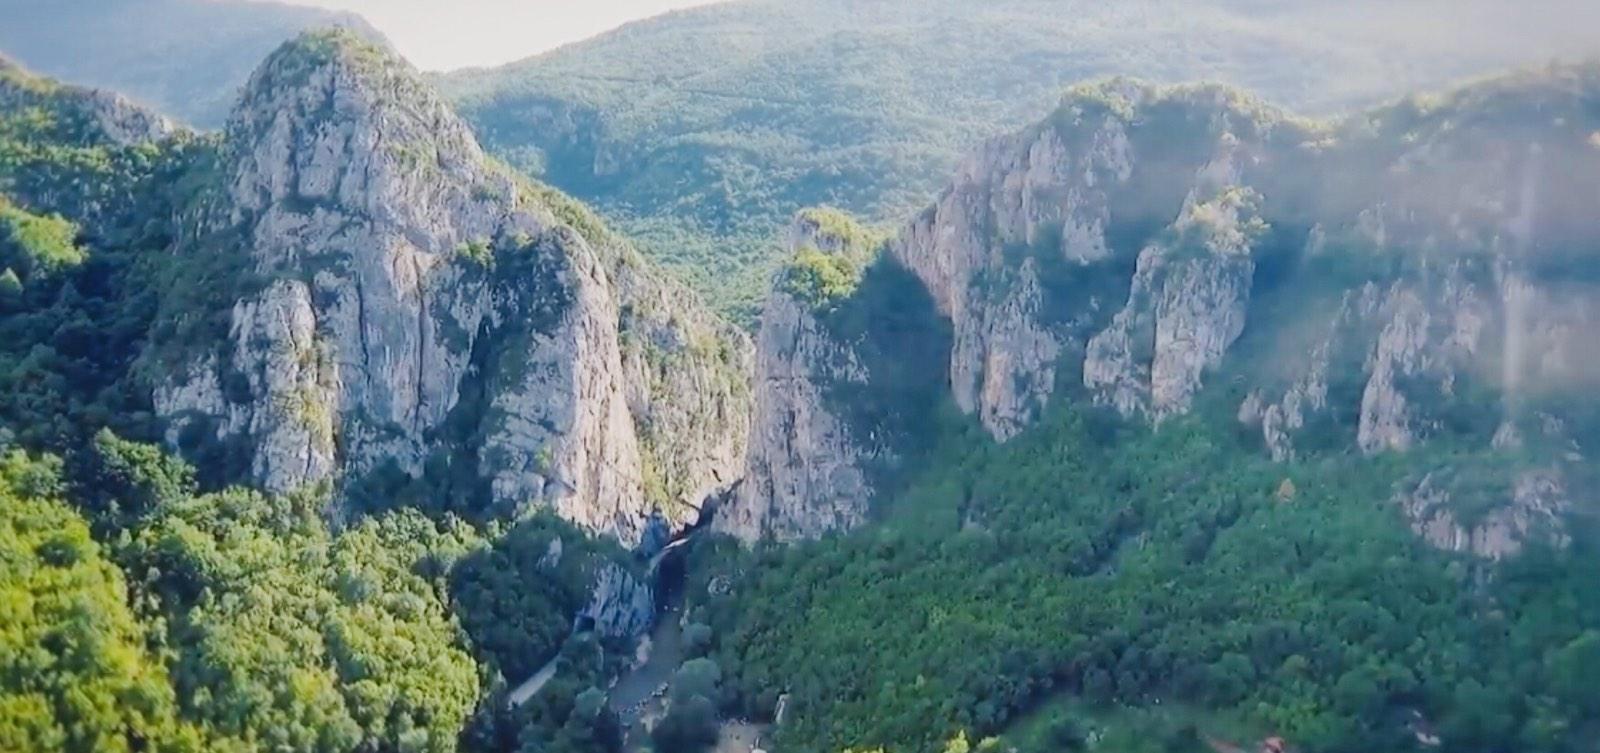 kanjon reke jerme iz vazduha